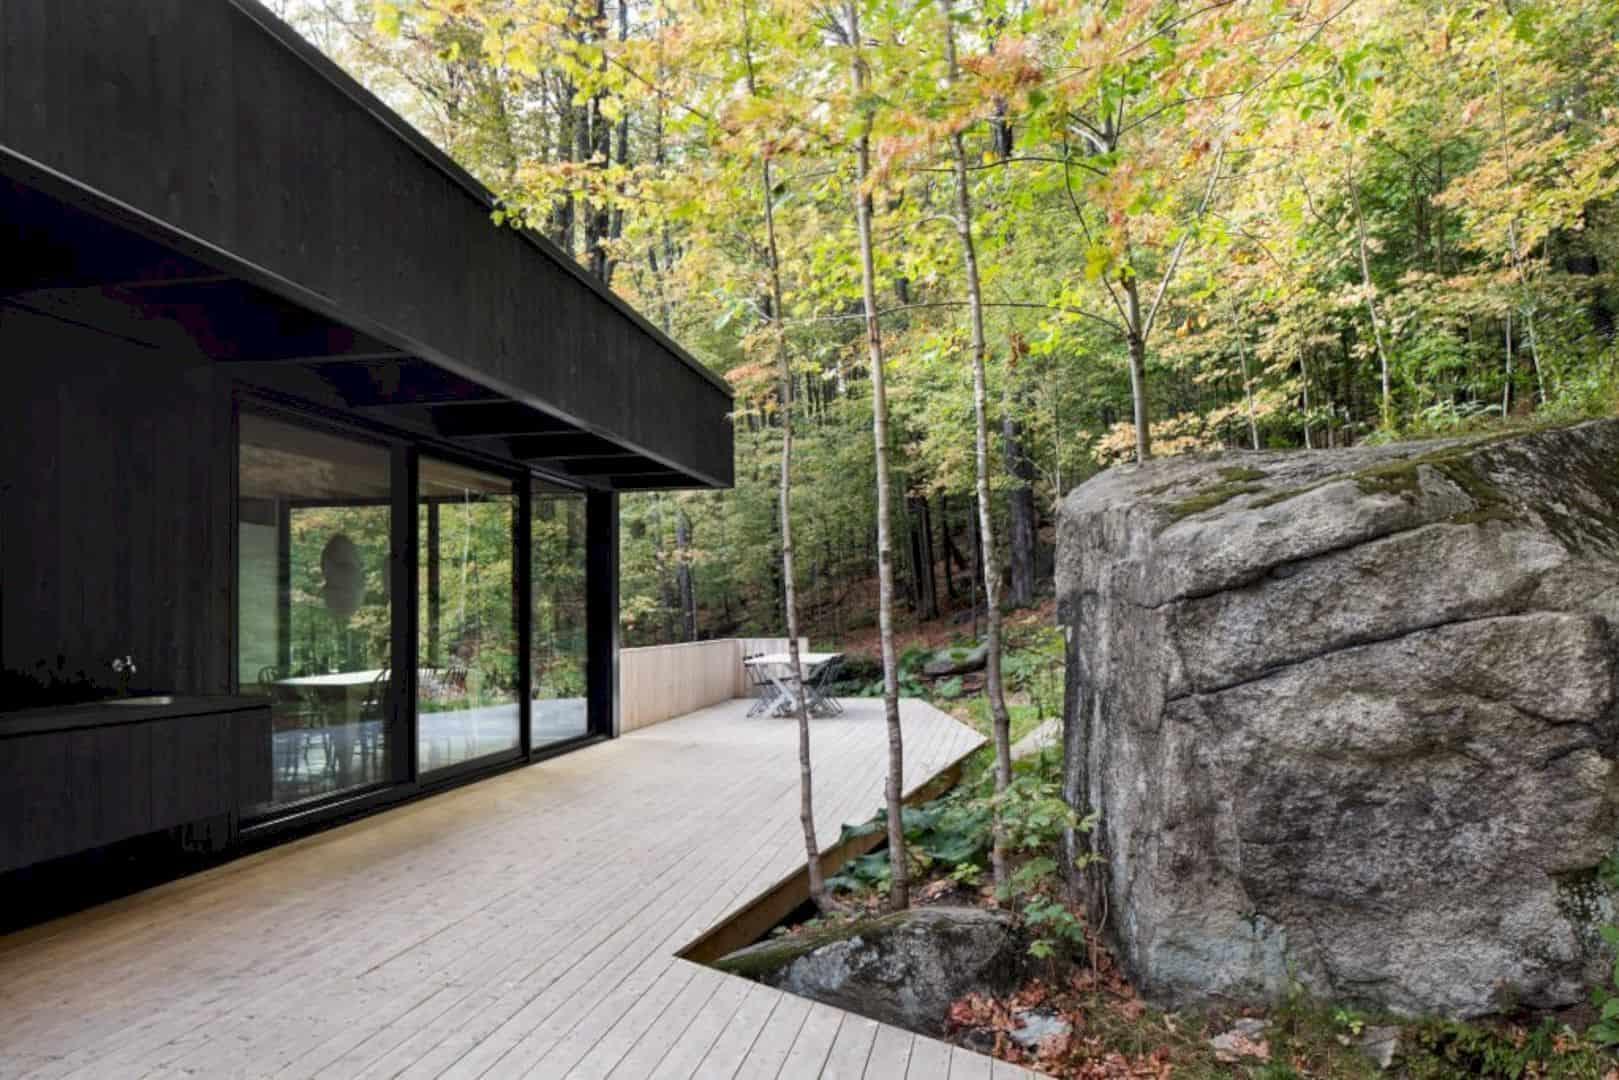 The Rock A Black House On A Hillside 2